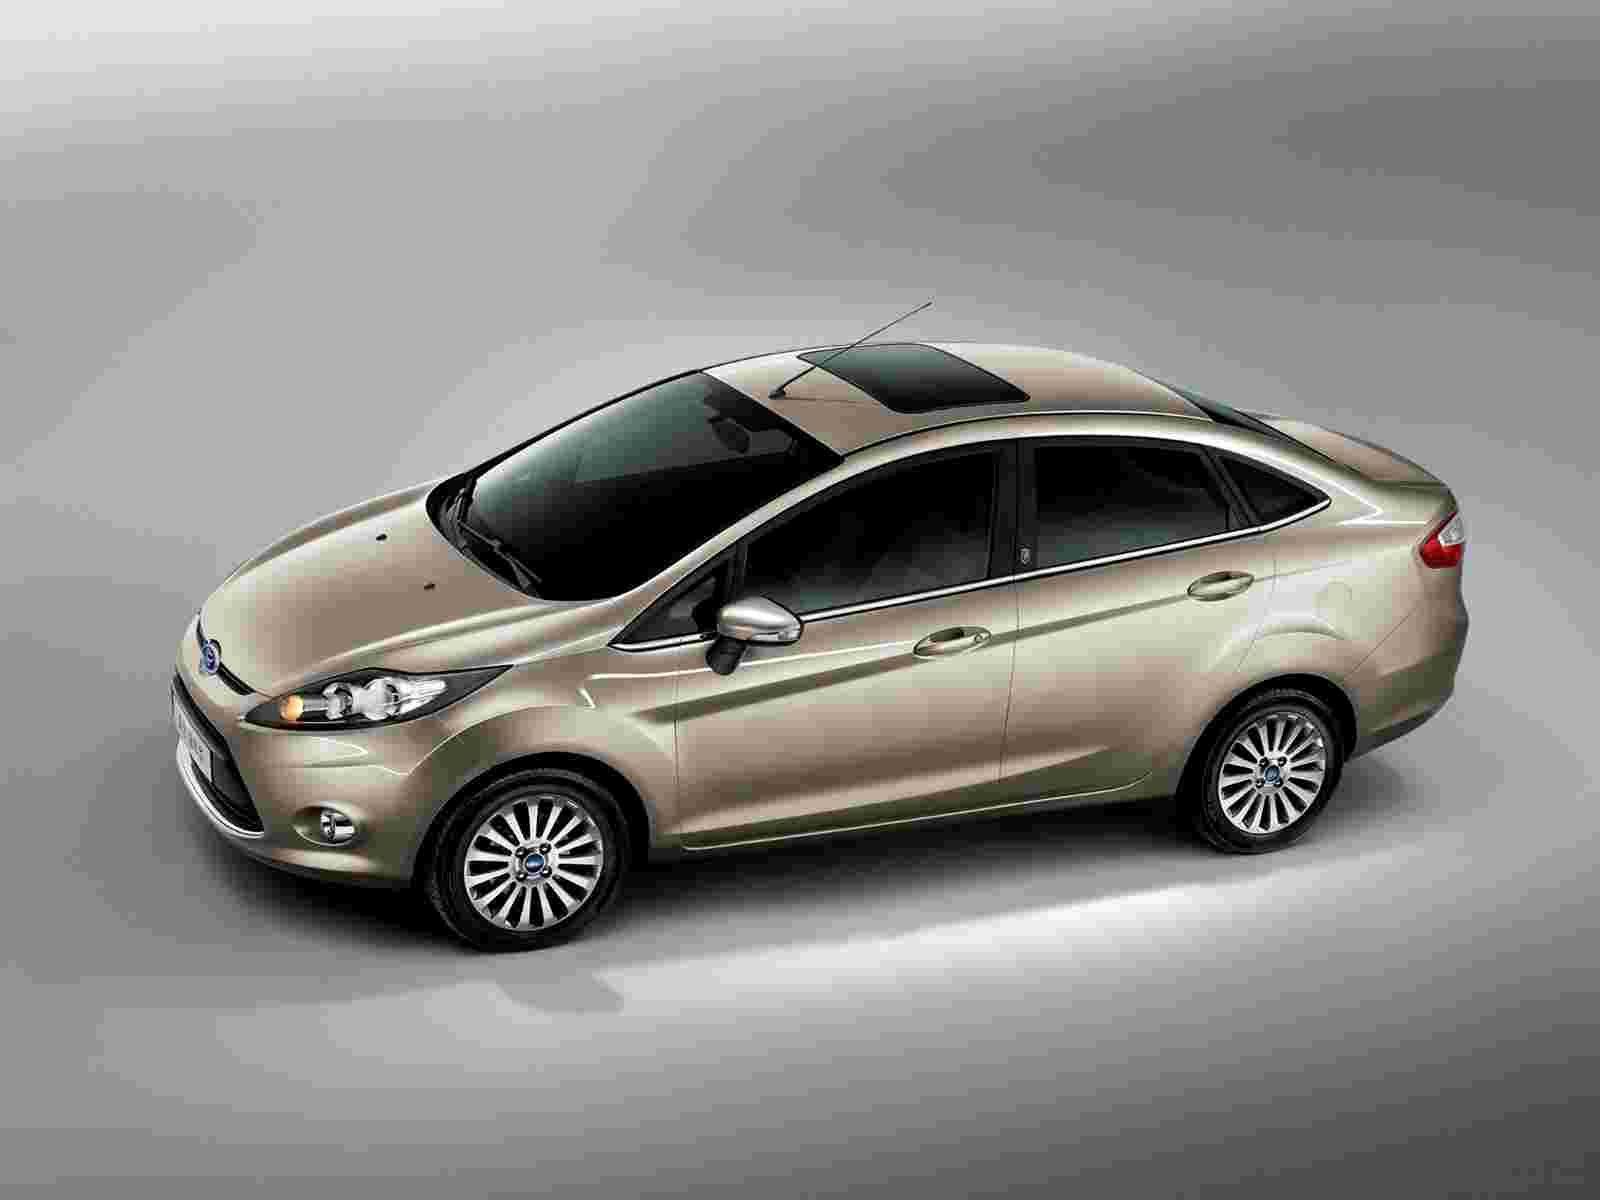 2010 ford fiesta sedan 2016 focus sedan hatchback compact car ford fiesta. Black Bedroom Furniture Sets. Home Design Ideas